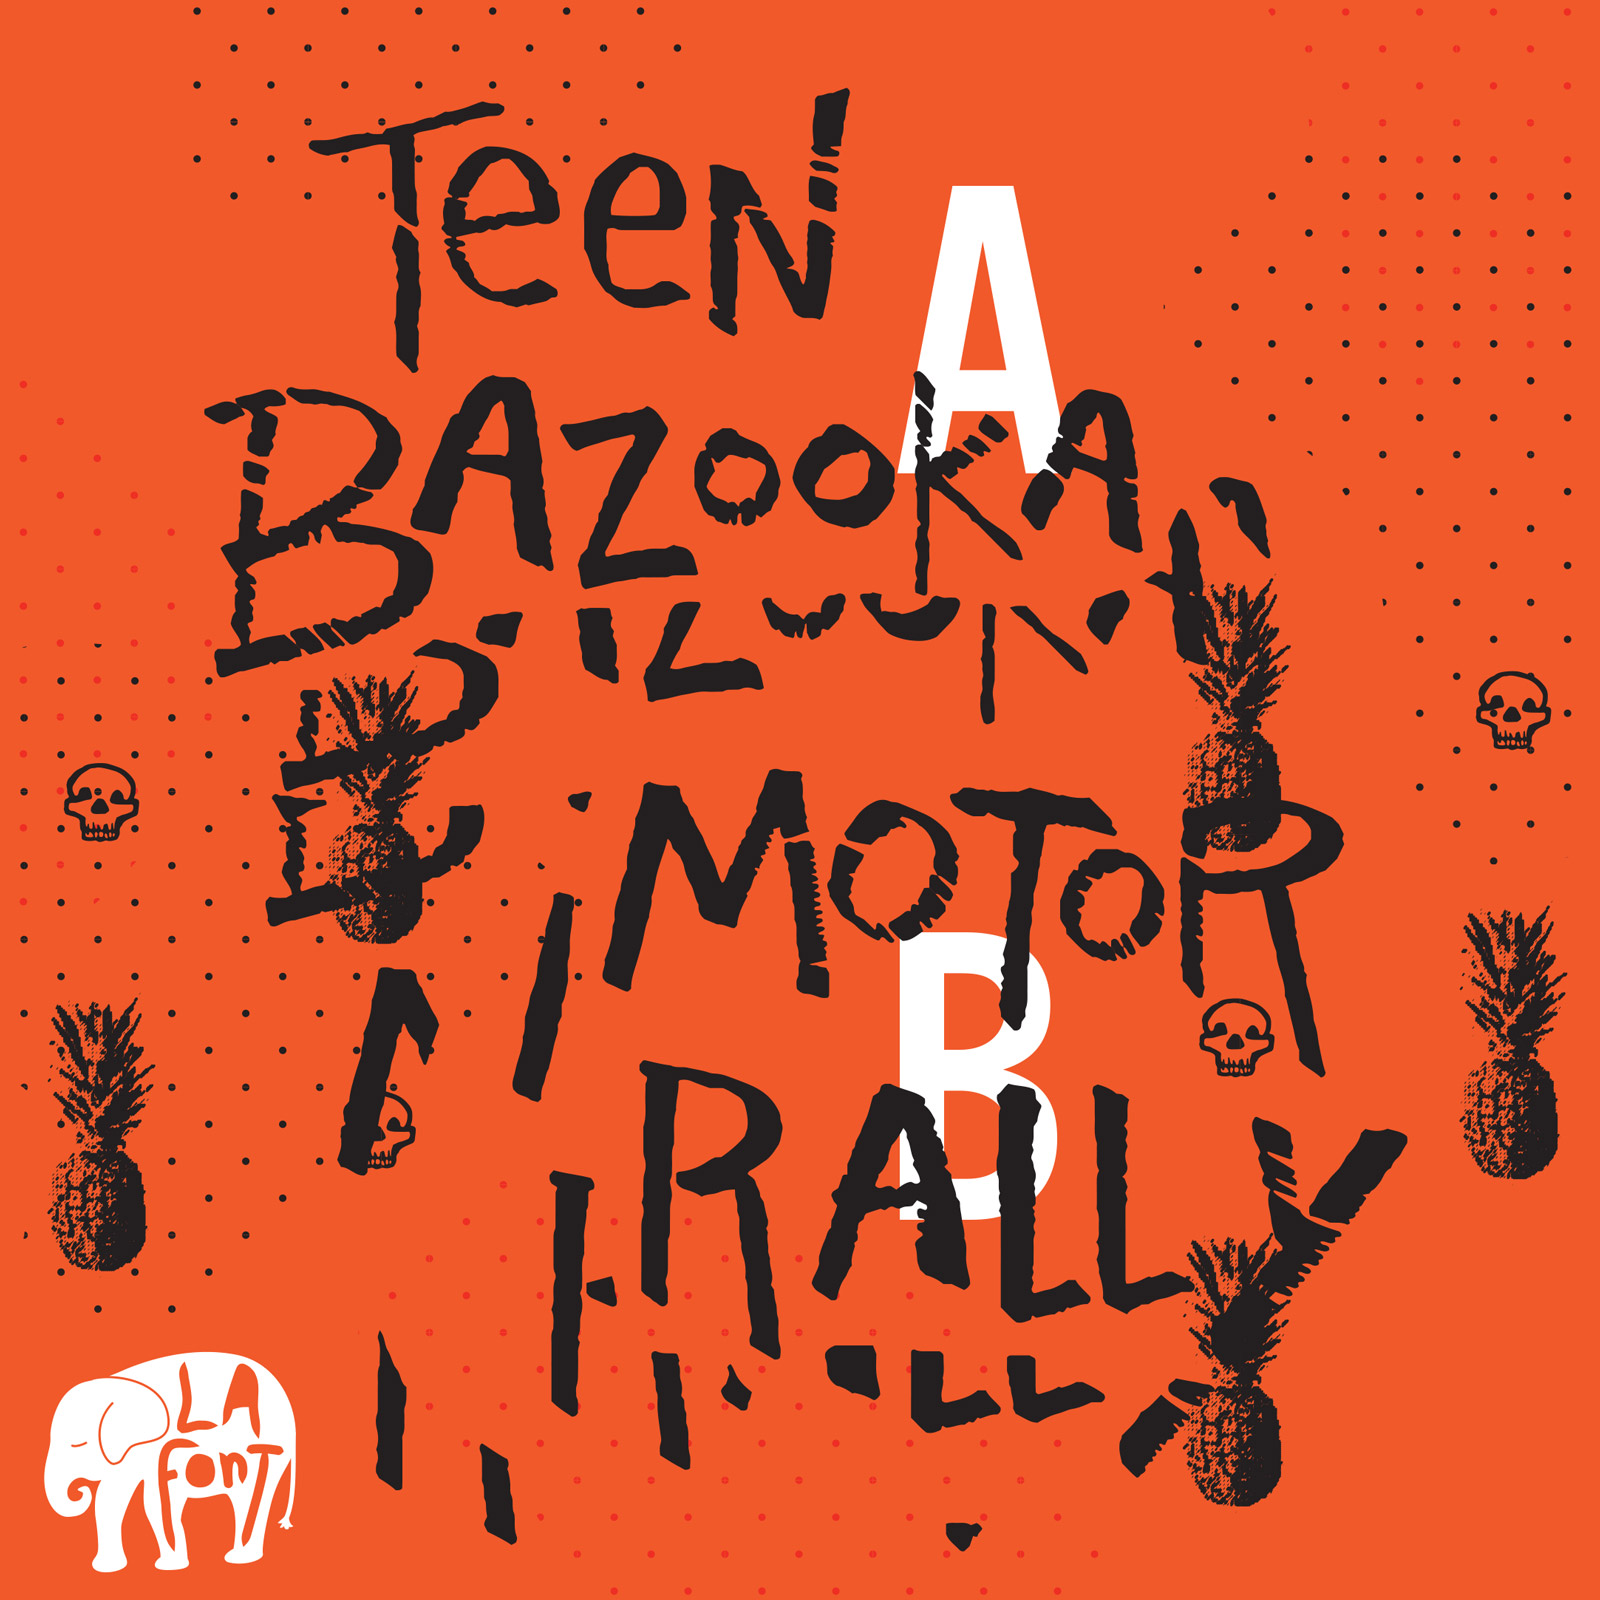 LA Font Teen Bazooka Motor Rally